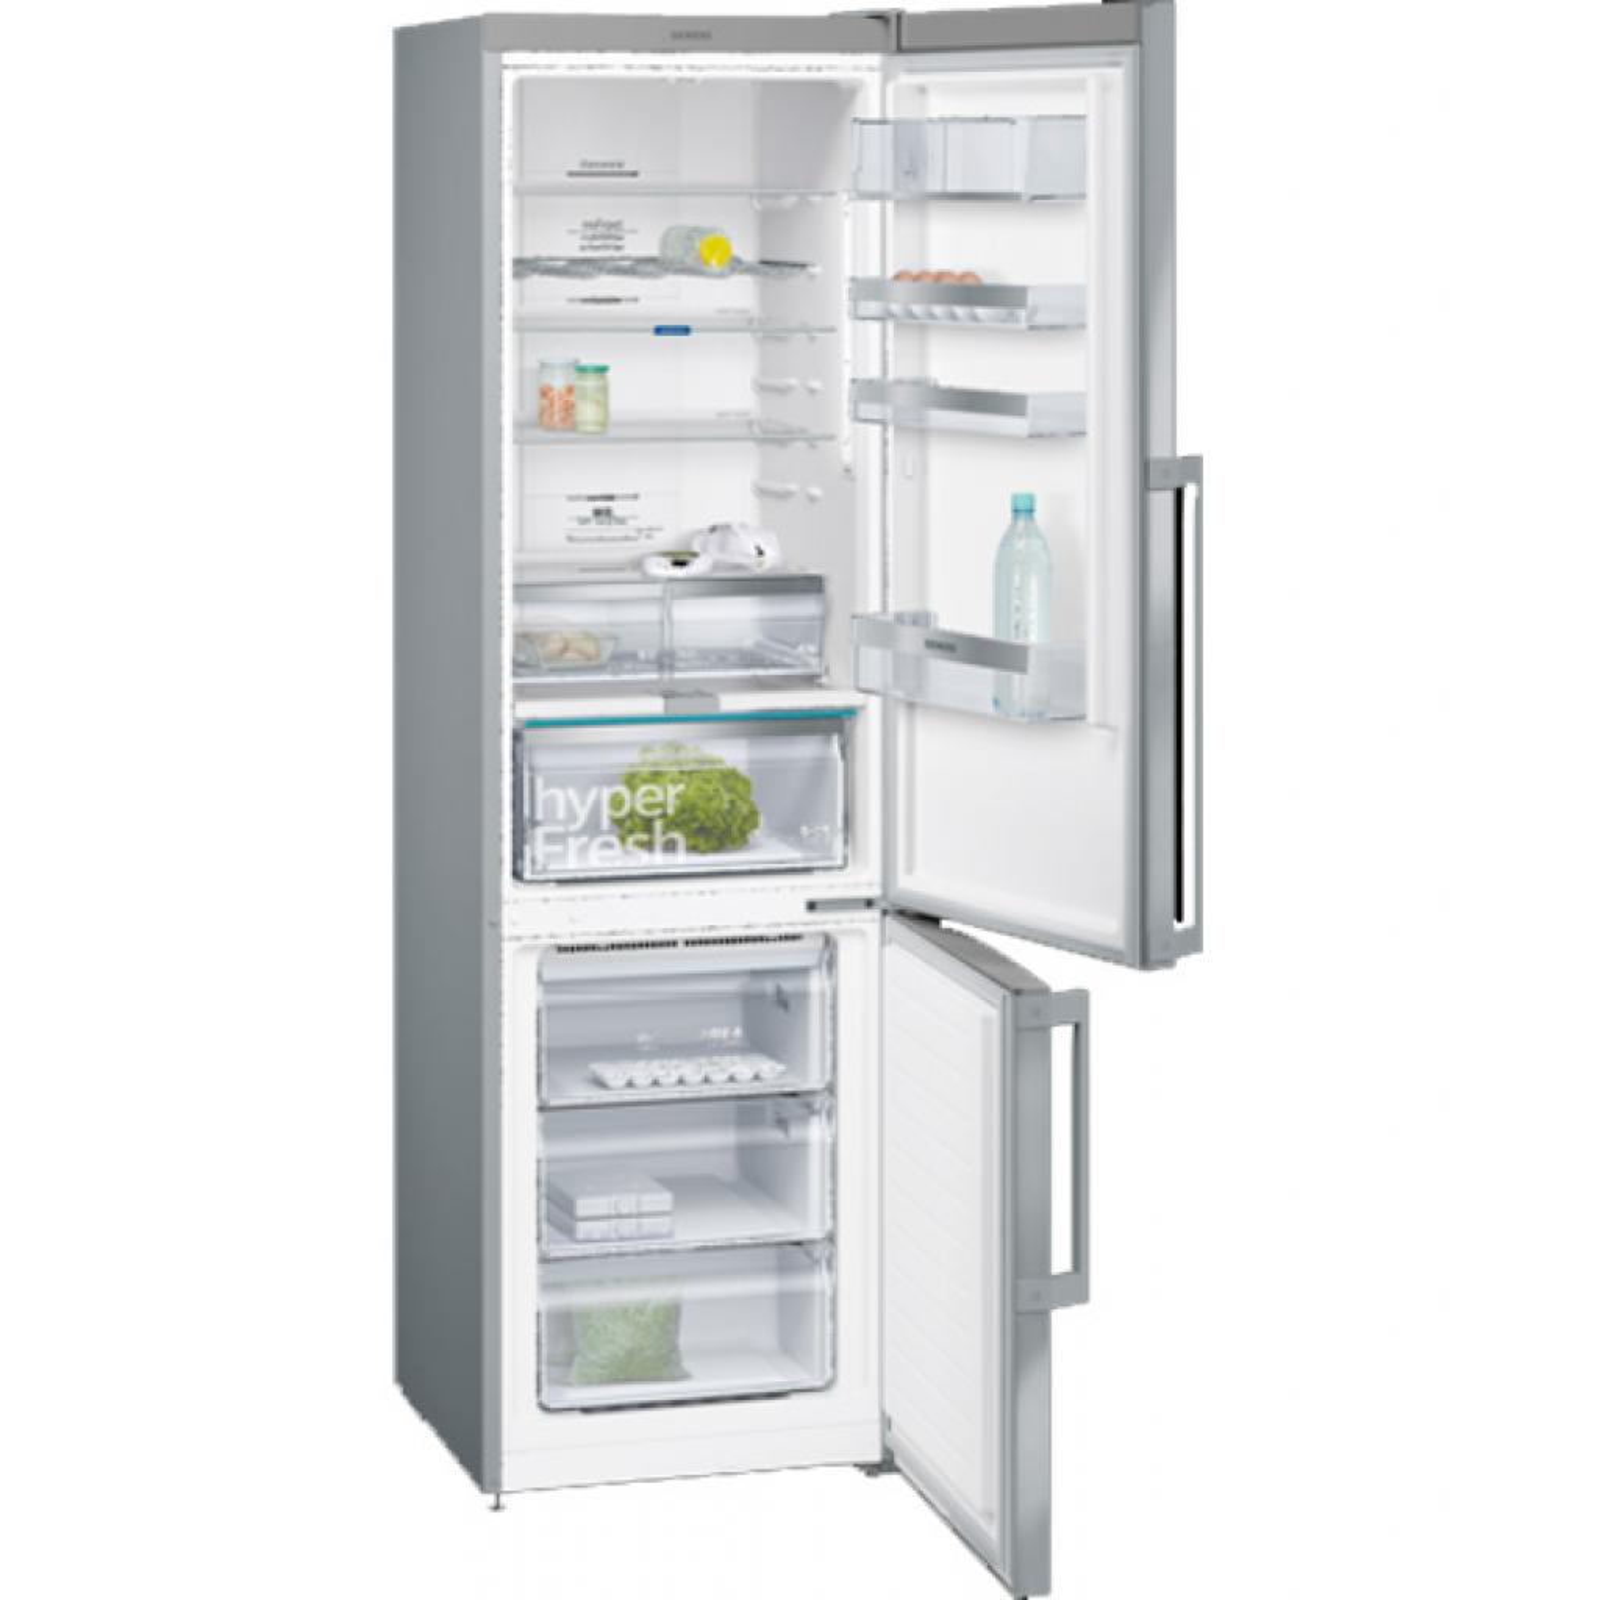 Холодильник Siemens KG 39 NAI 36 (KG39NAI36) изображение 2